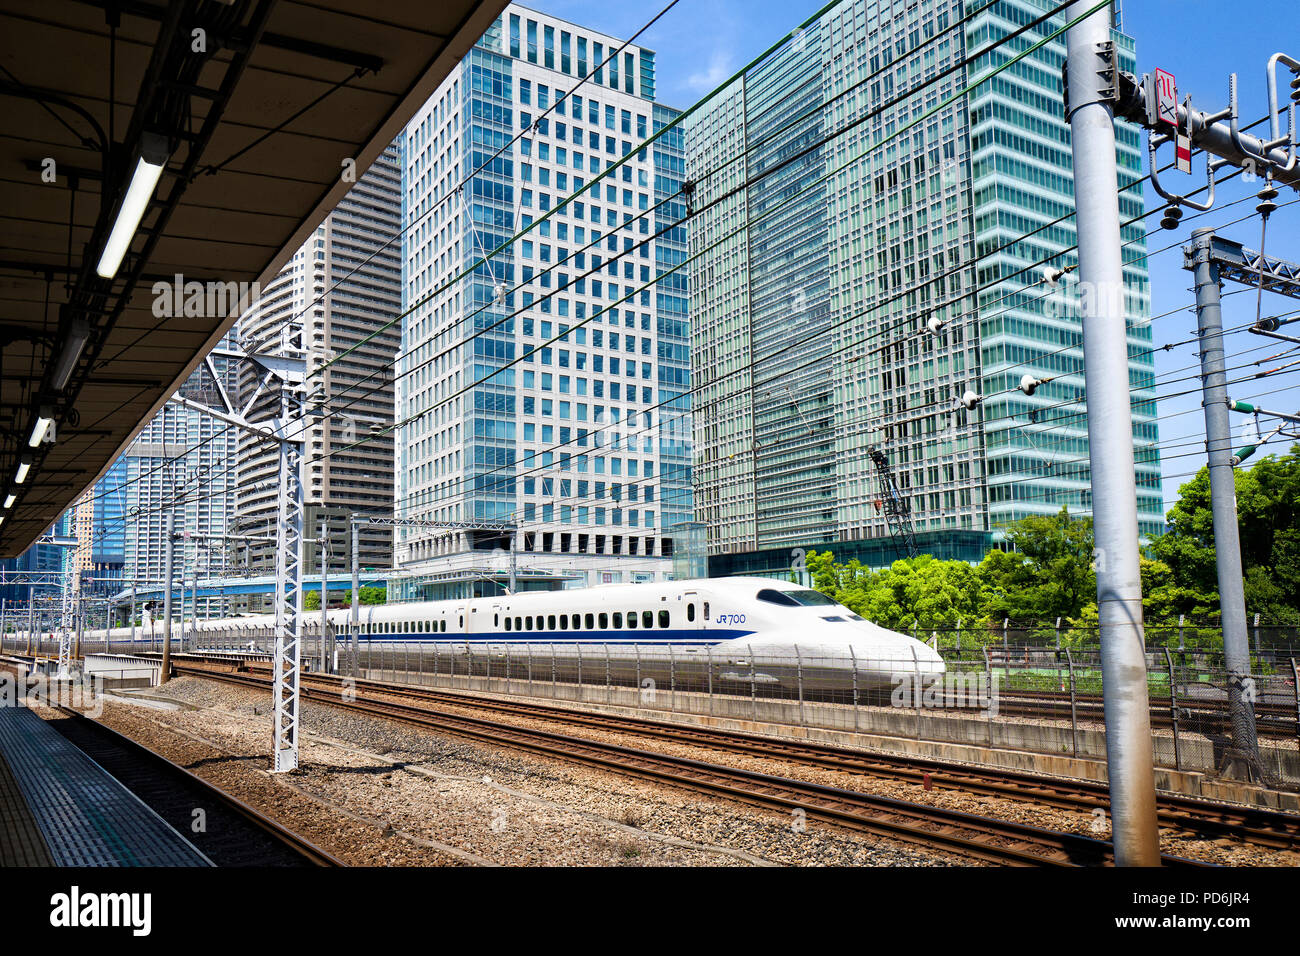 L'île de Honshu, Japon, Tokyo, Kanto, une exécution Shinkansen de Tokyo. Photo Stock